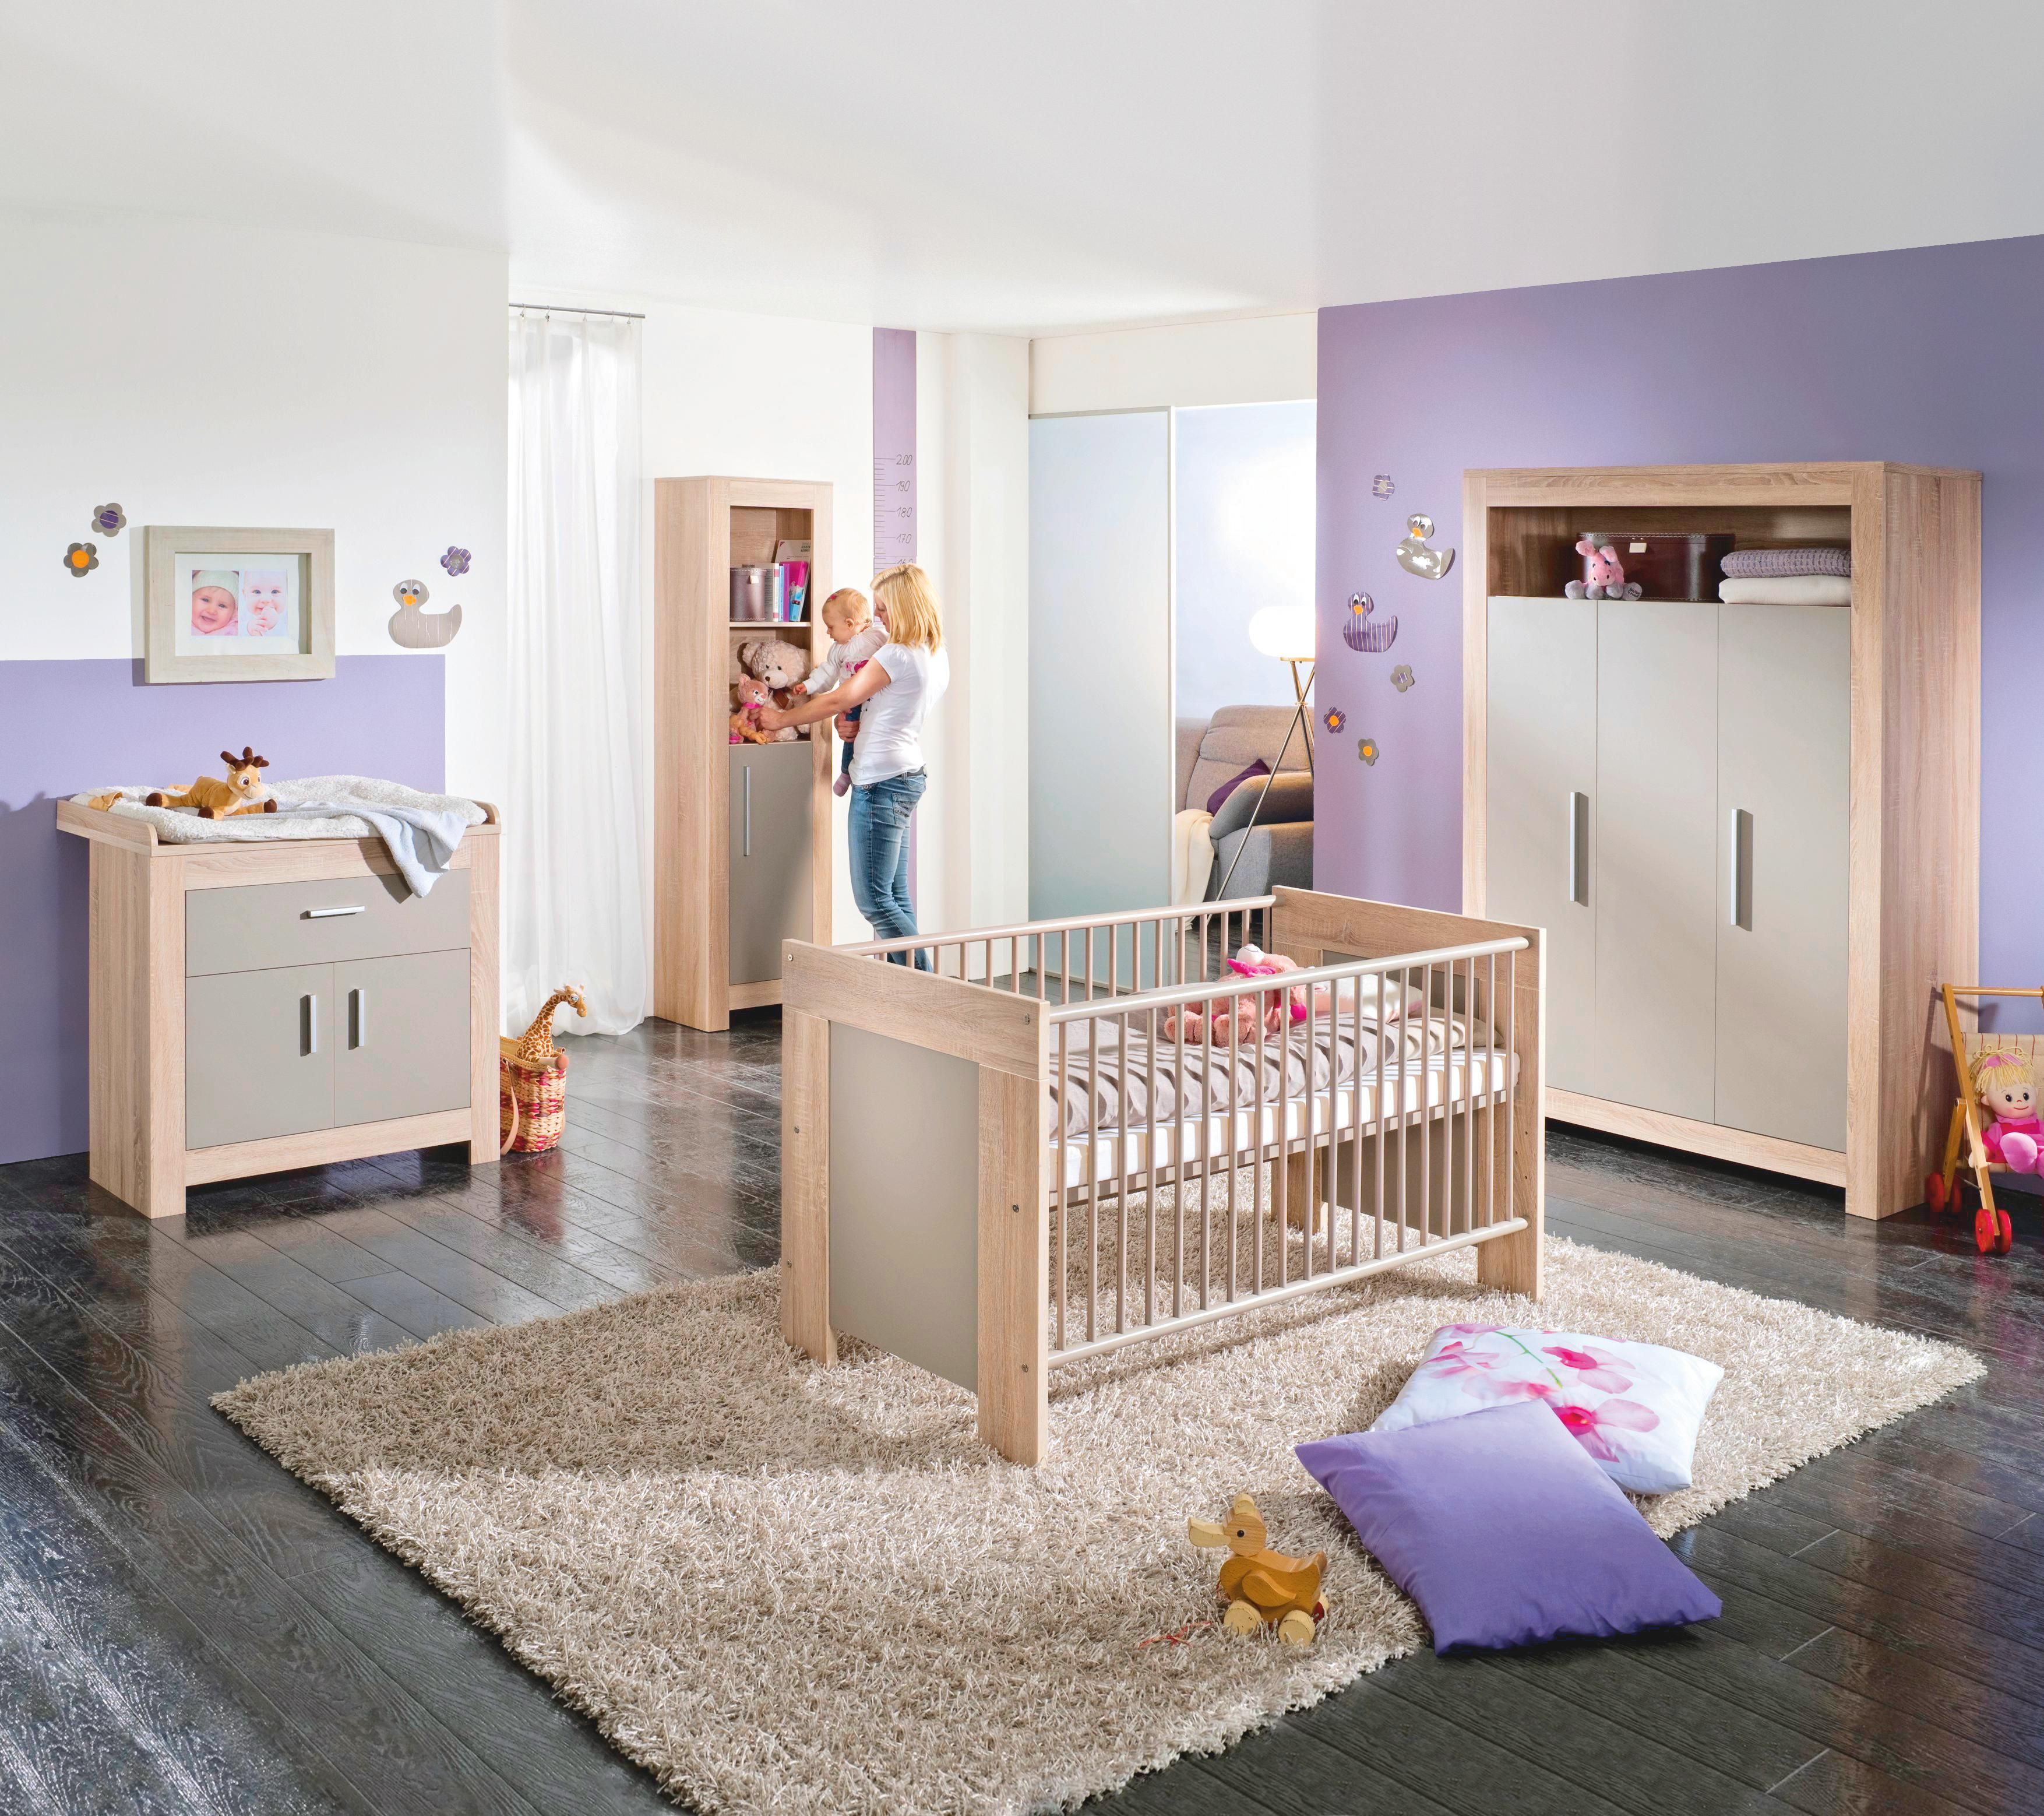 wickelkommode paul eichefarben grau wickelkommode 30 tag und kinderbetten. Black Bedroom Furniture Sets. Home Design Ideas